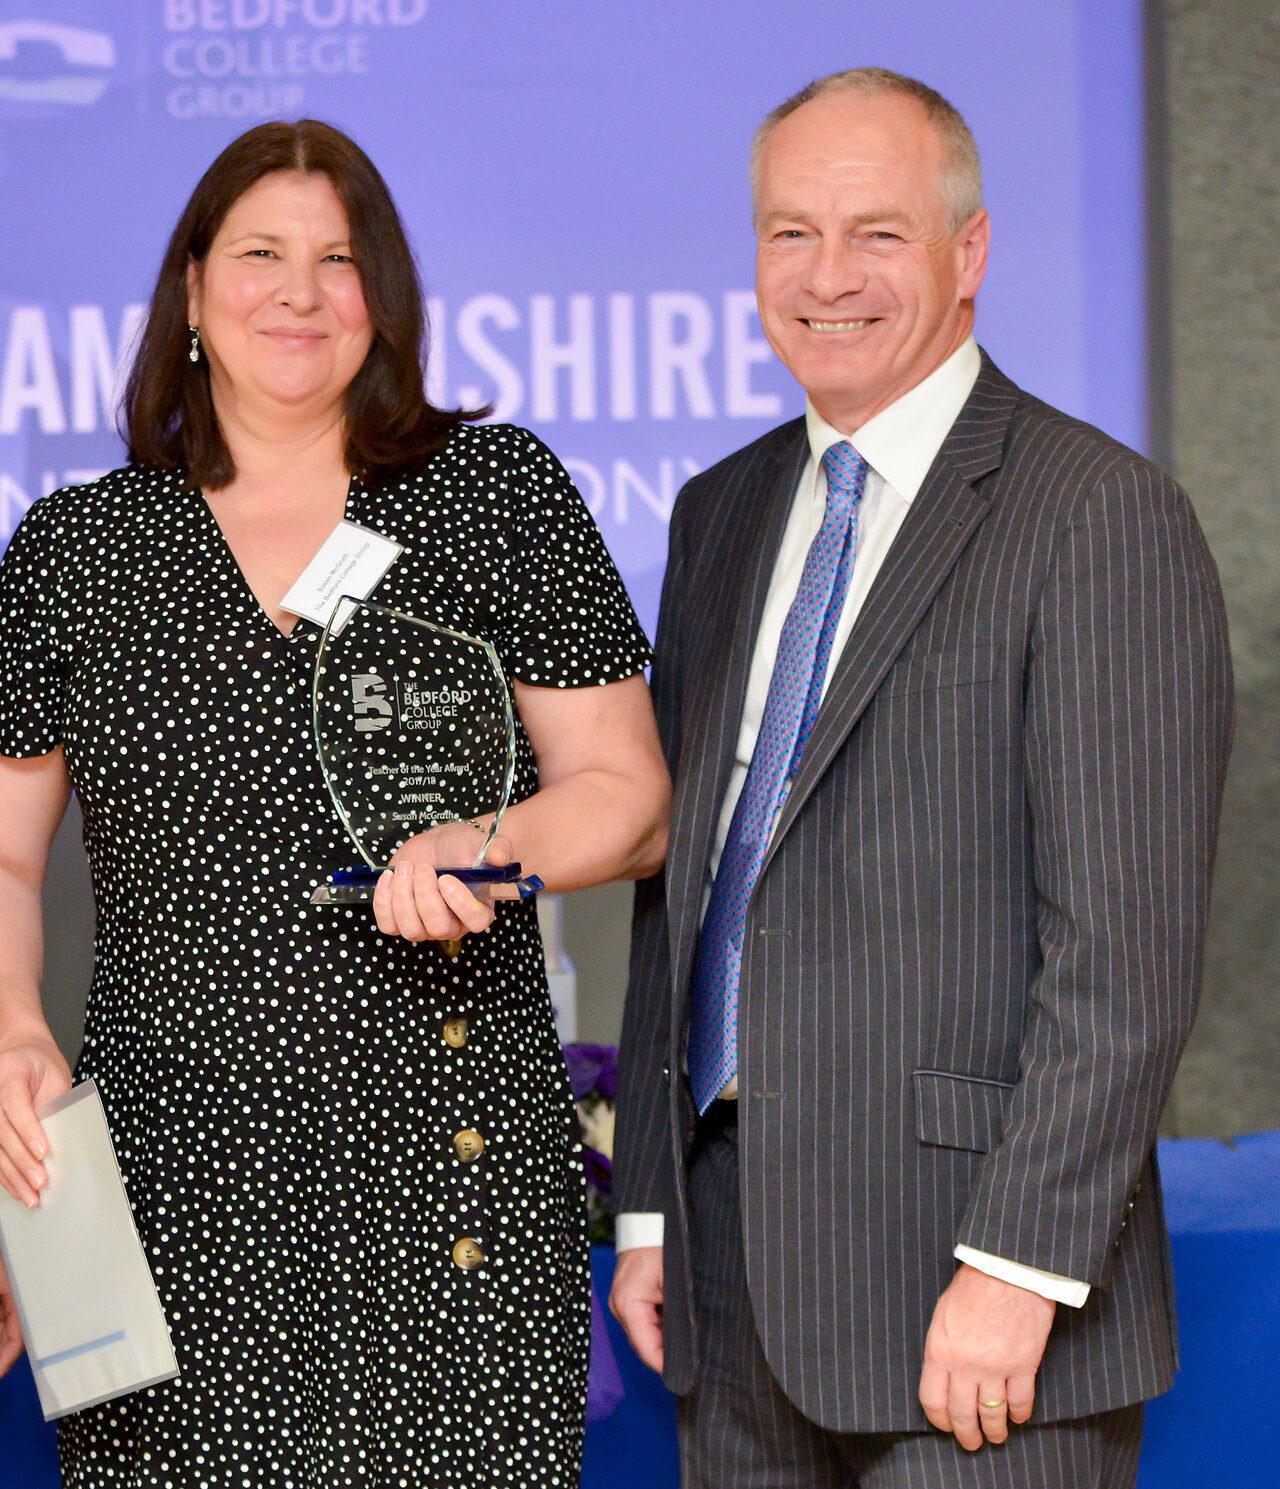 Tresham College Achievements Ceremony 2018